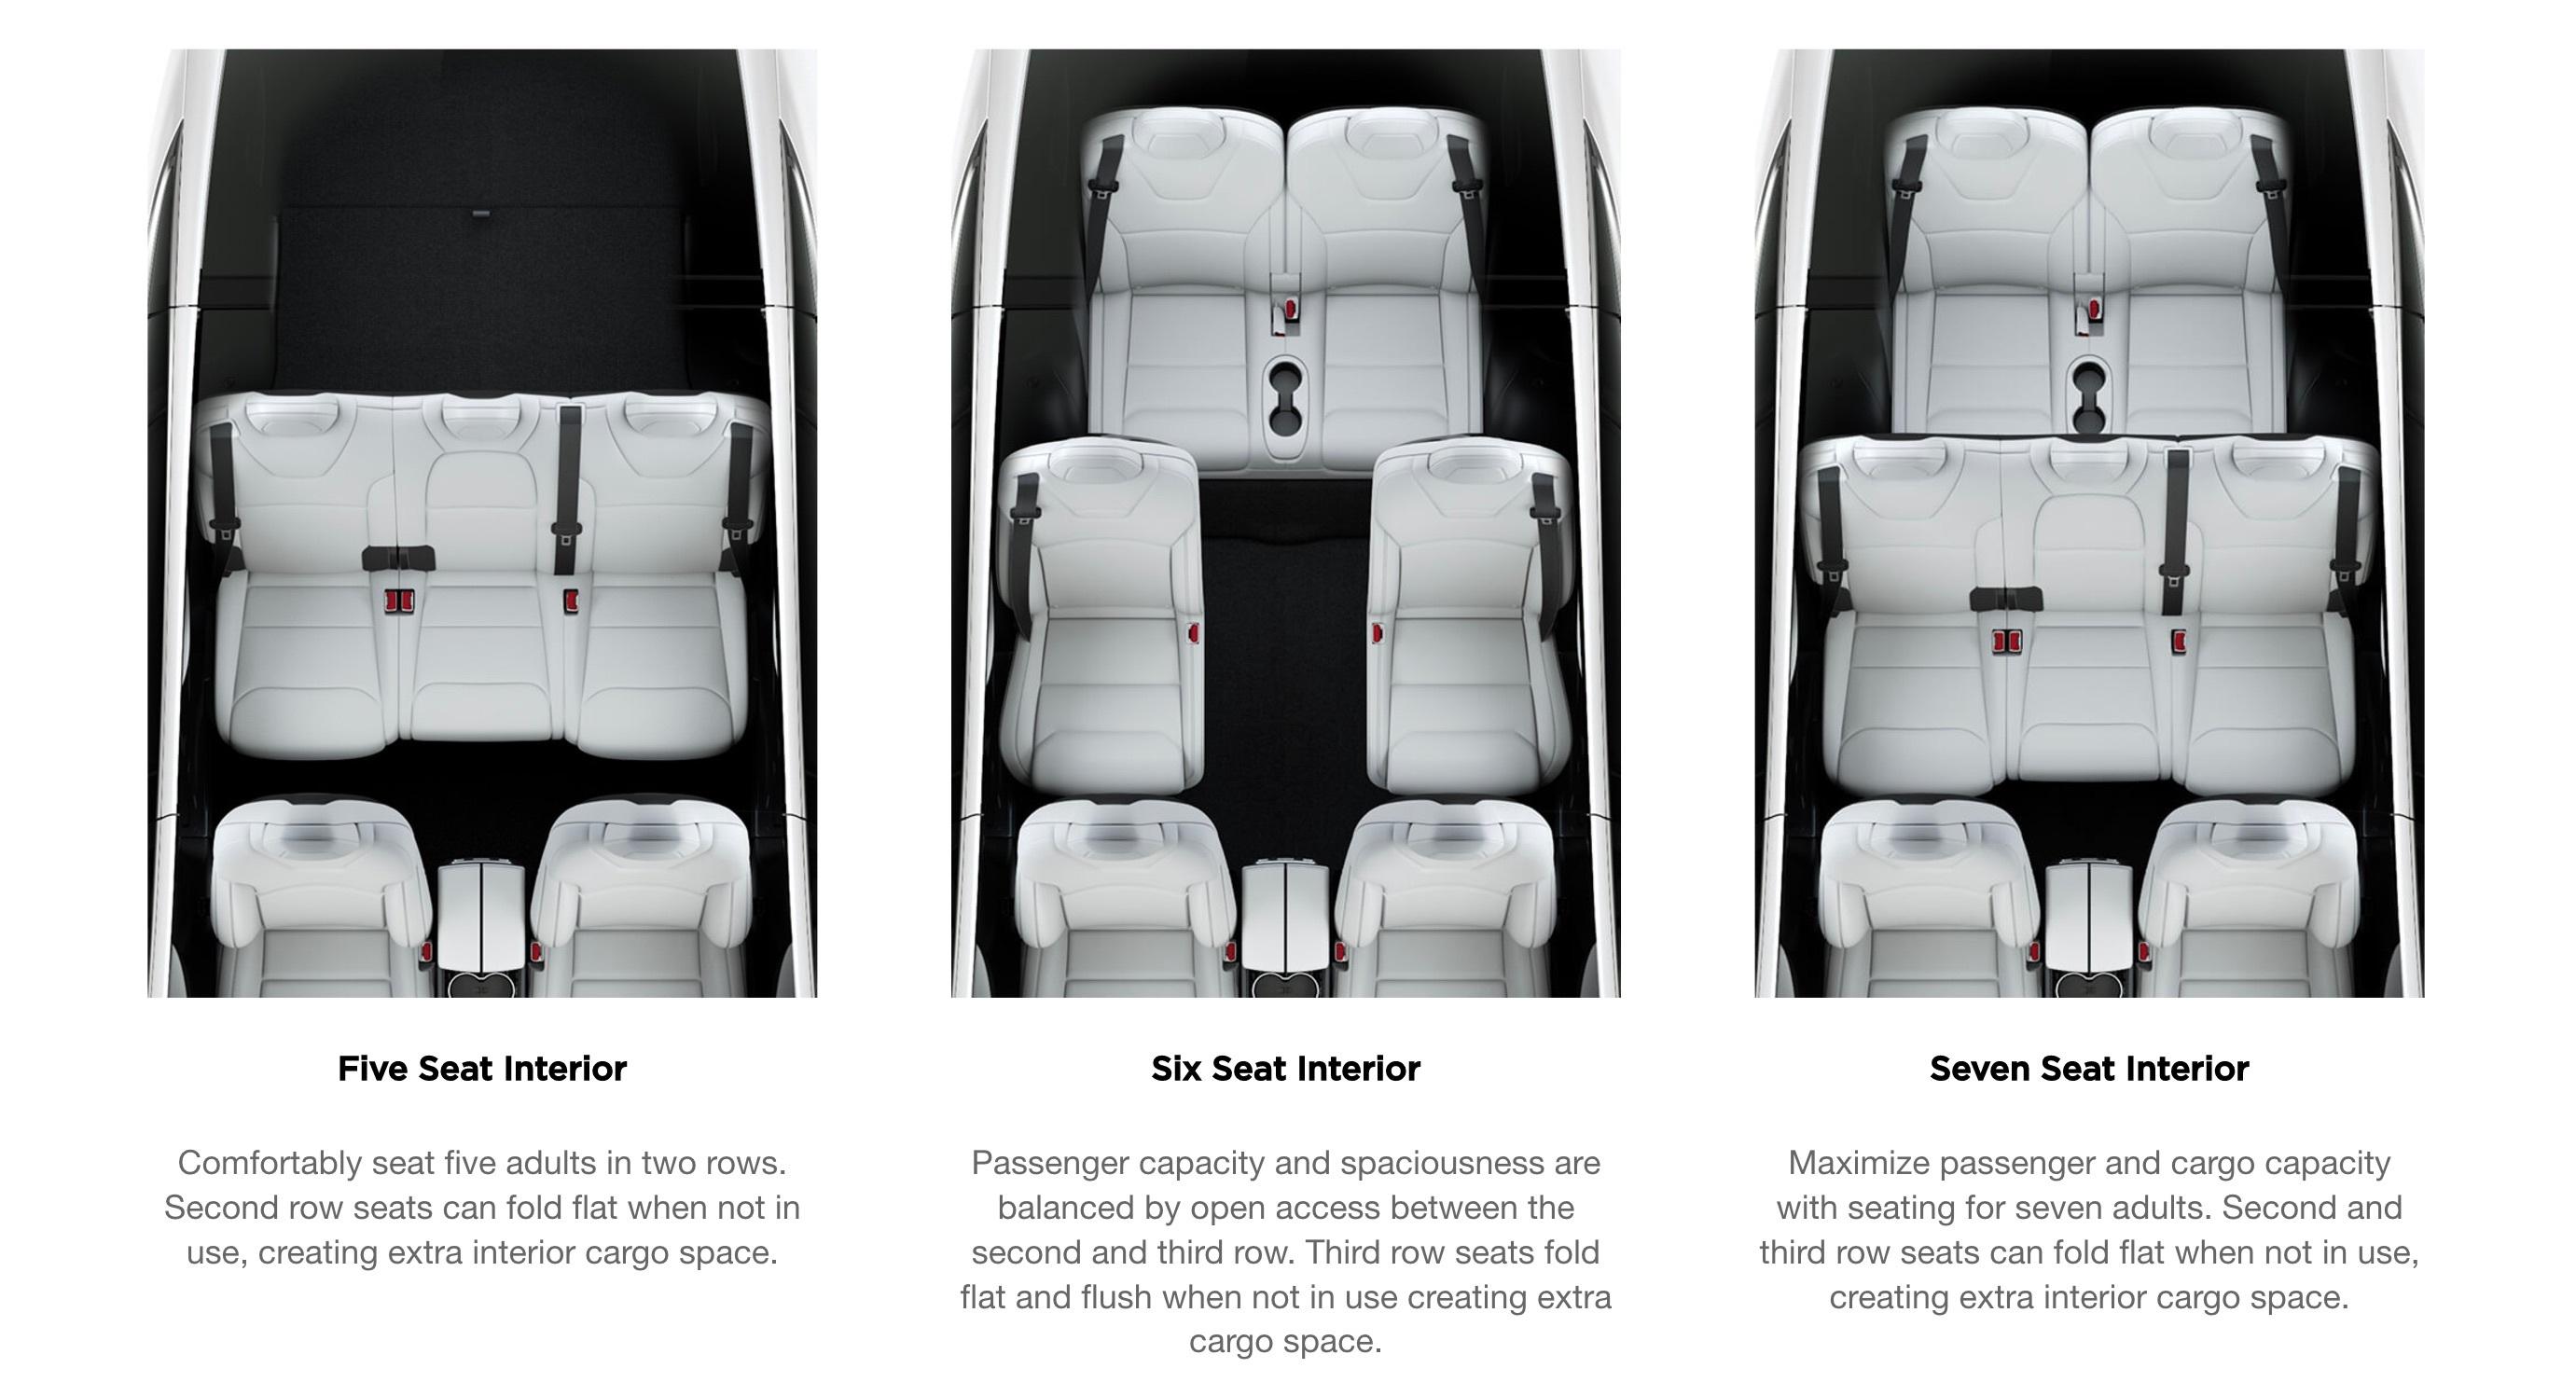 tesla-model-x-seating-configuration.jpg